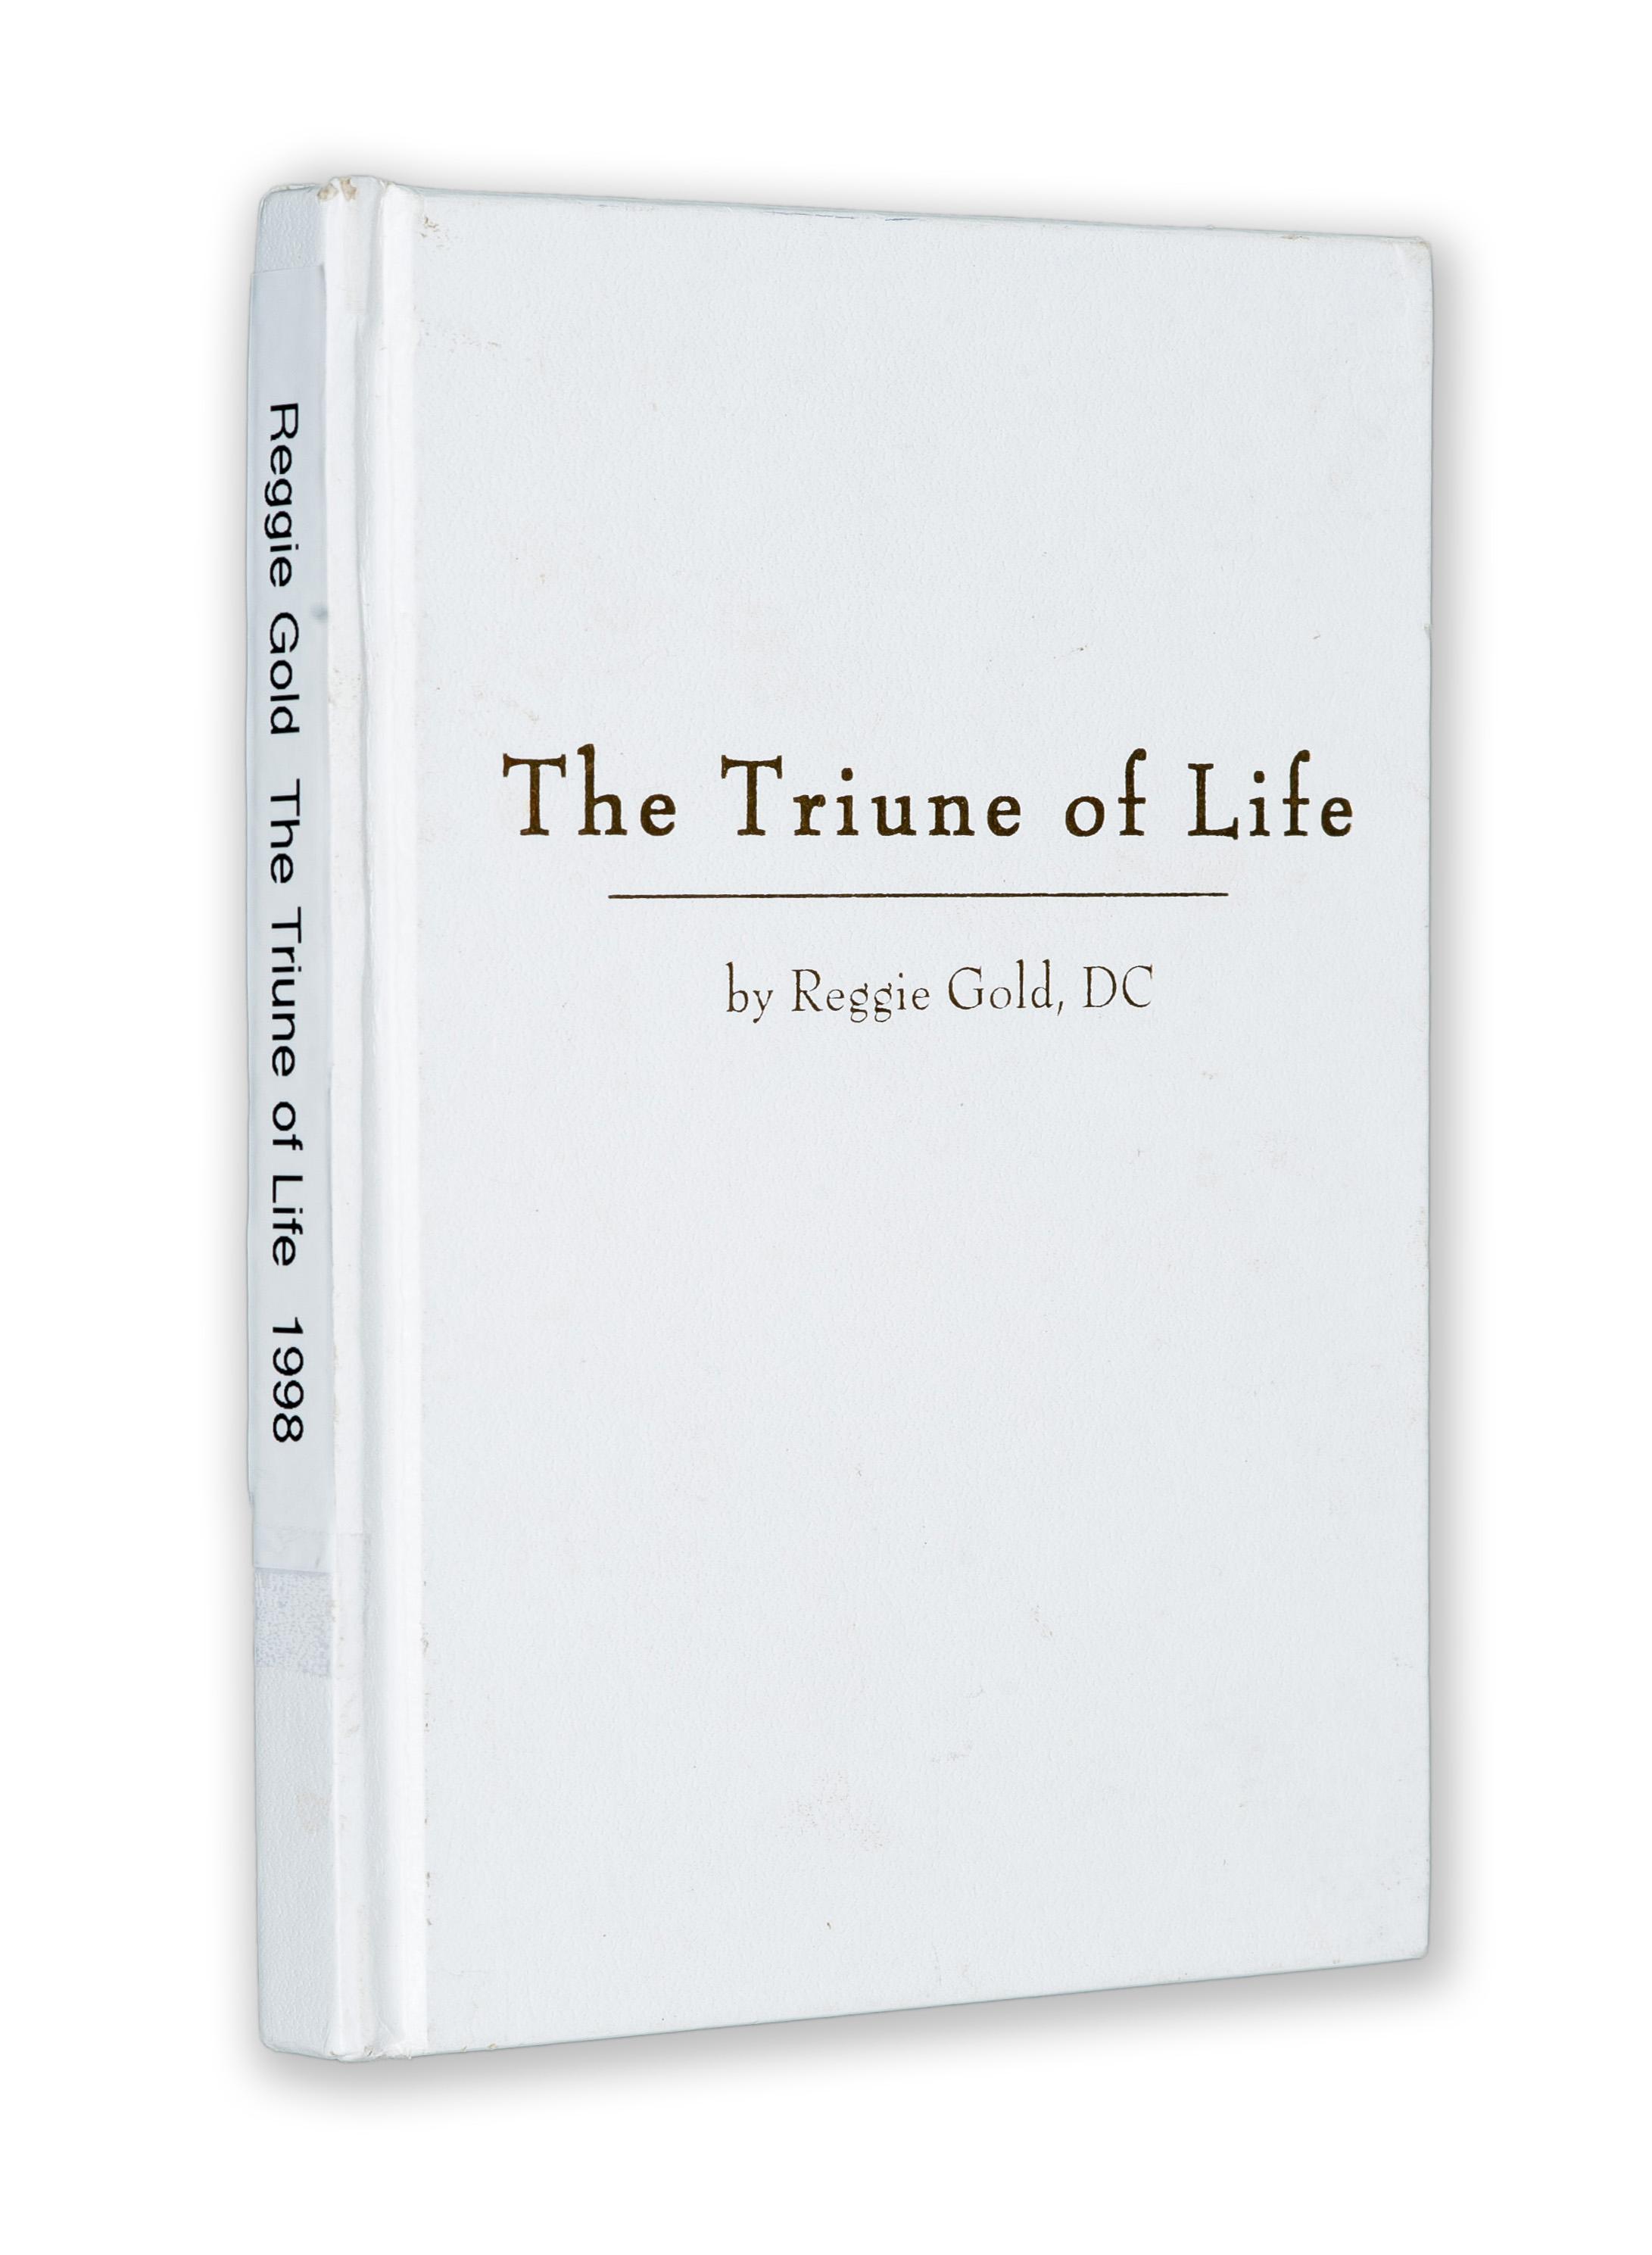 Triune of Life (1998)